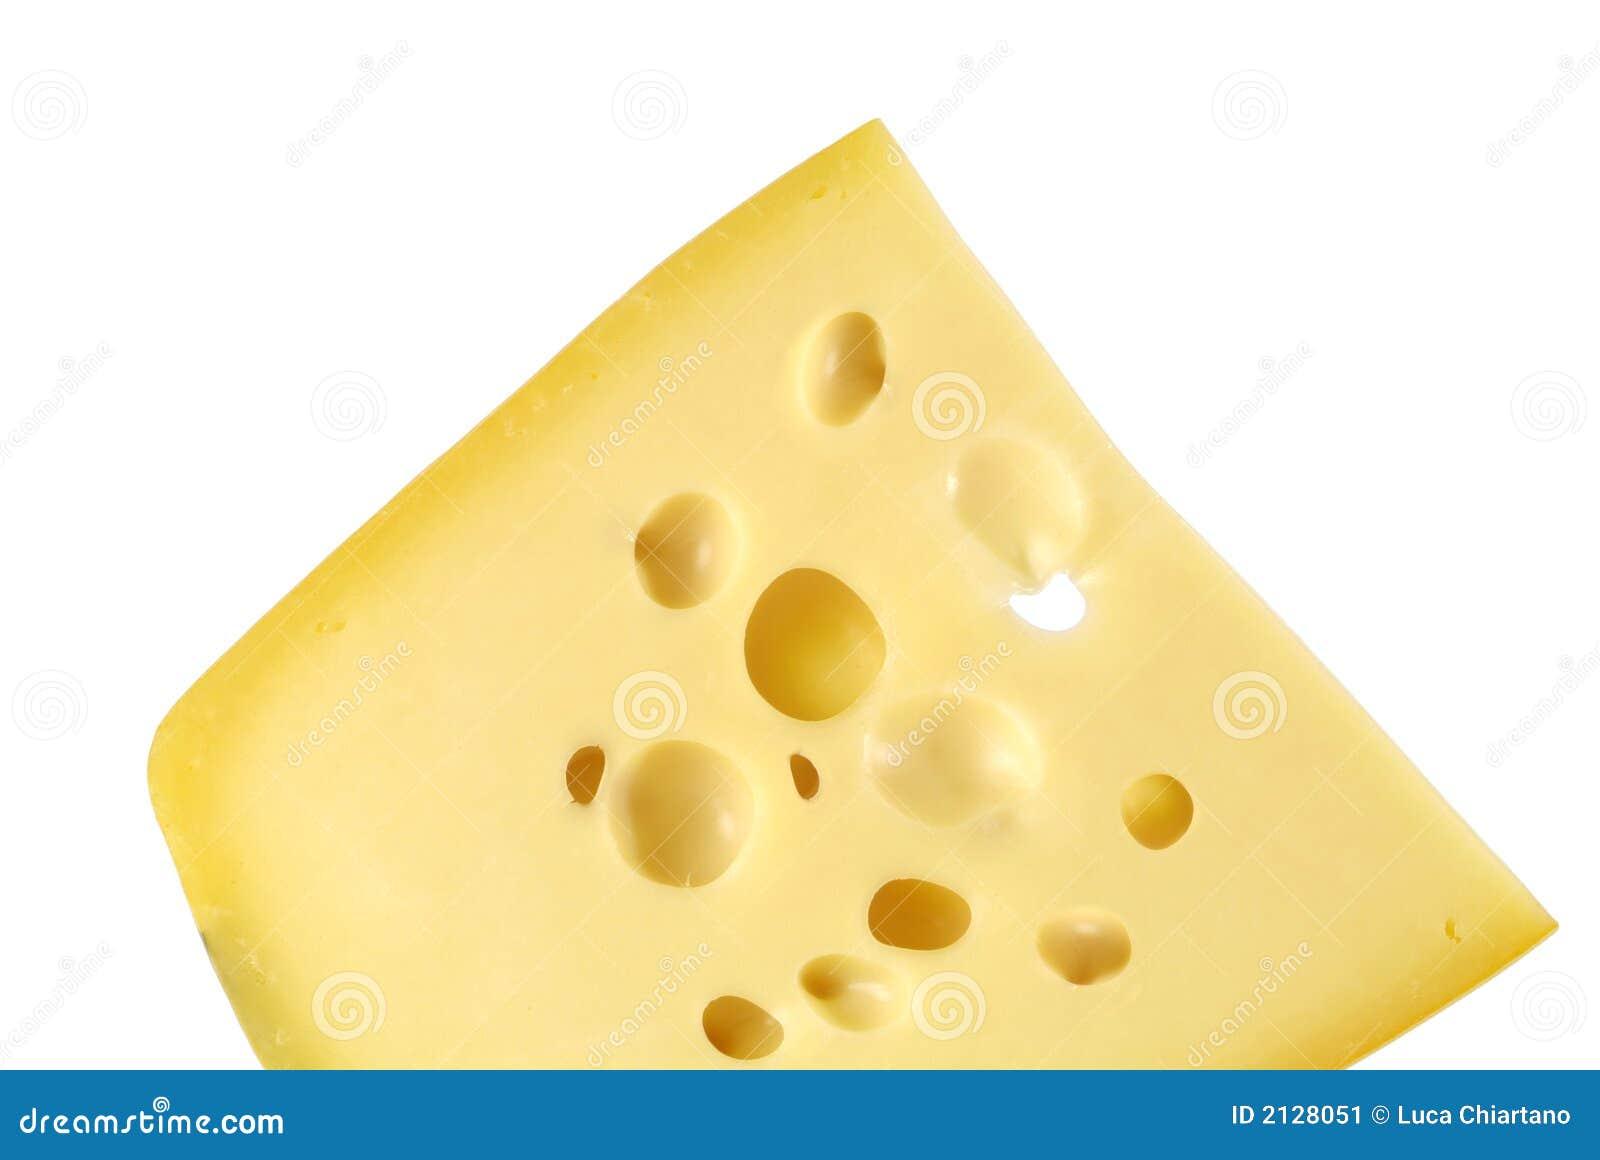 swiss cheeze stock photo cartoondealer com 10548582 cheese pizza slice clipart Slice Cheese Pizza